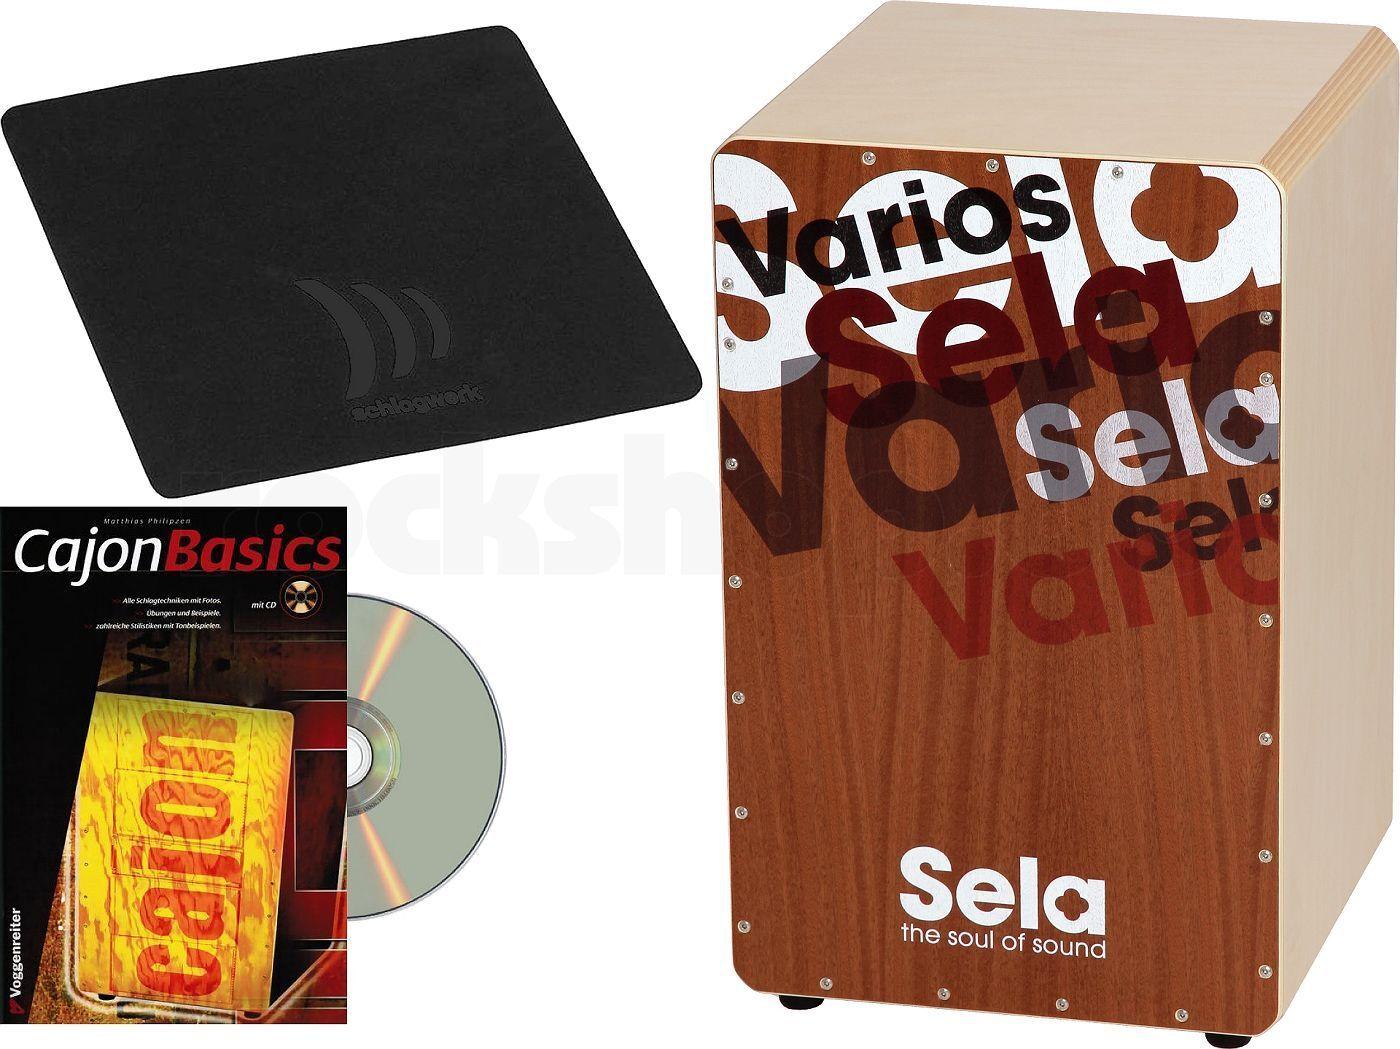 Sela SE 0 13 Varios Snare Cajon mit Schlagwerk Sitz Pad SP 20 + Lern Buch + CD